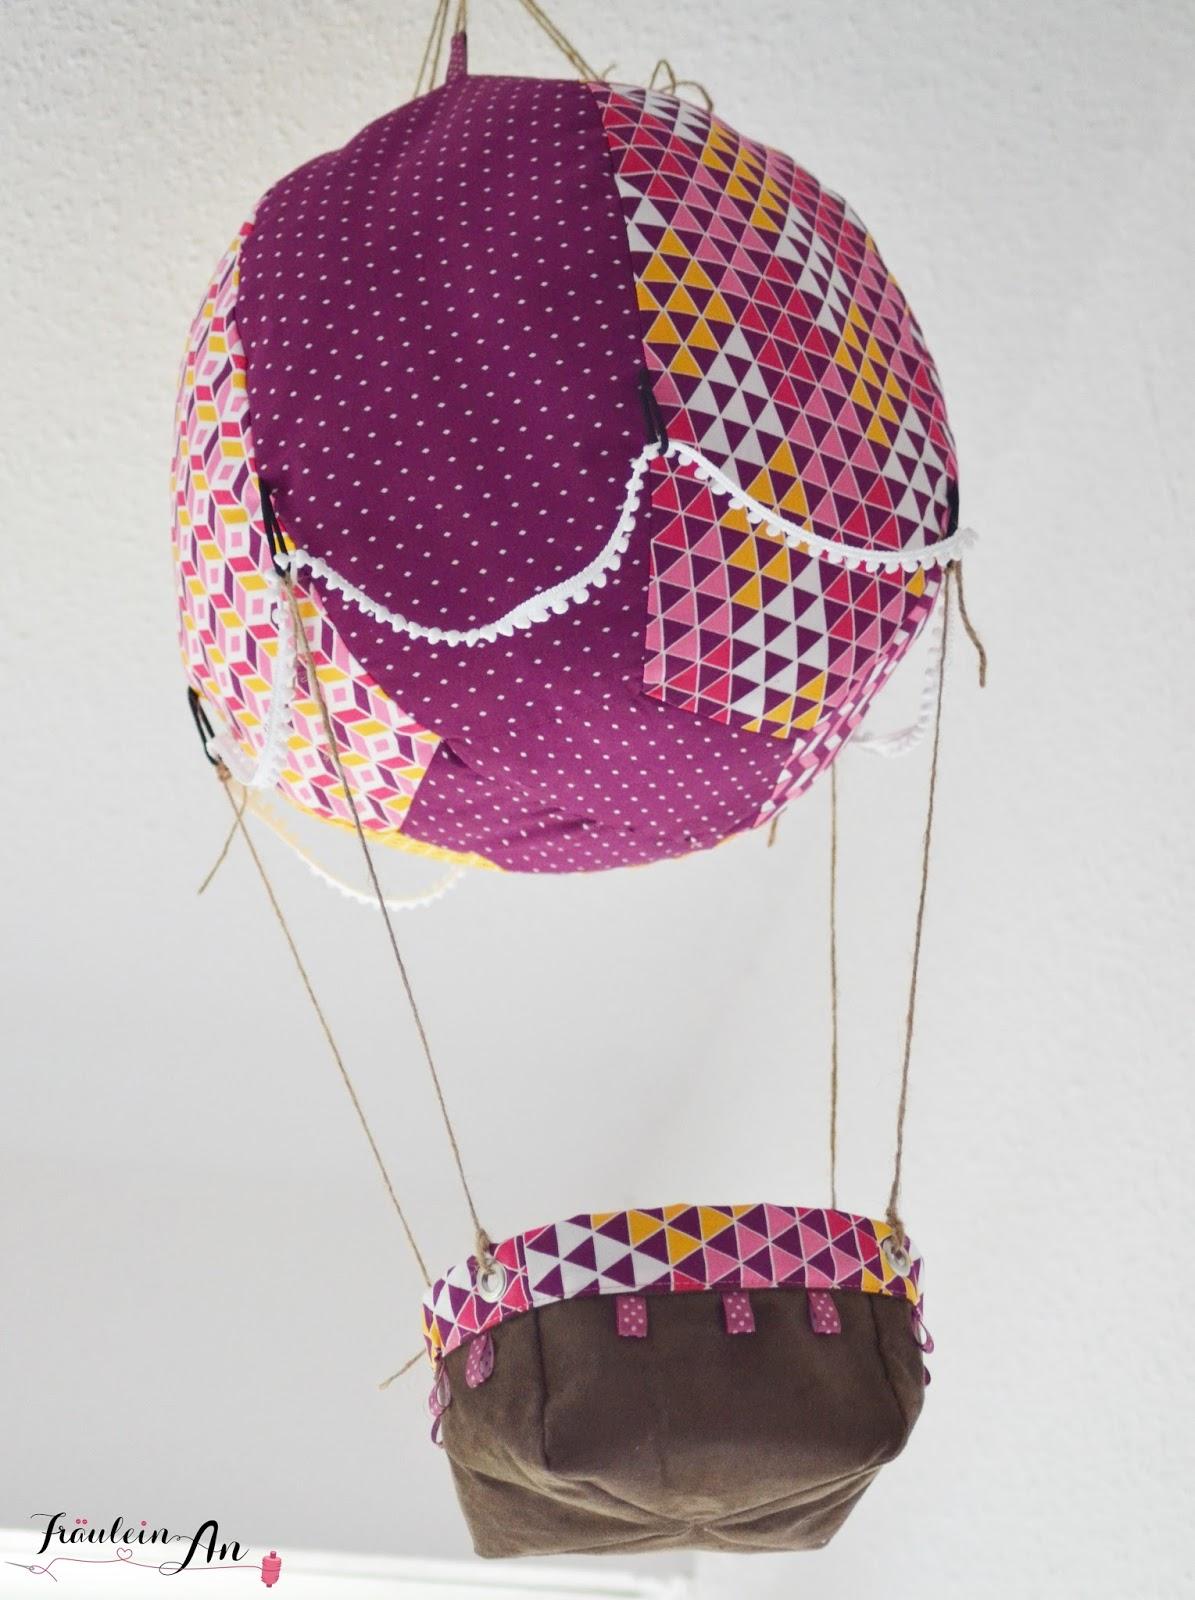 Fräulein An: Heißluftballon für\'s Kinderzimmer